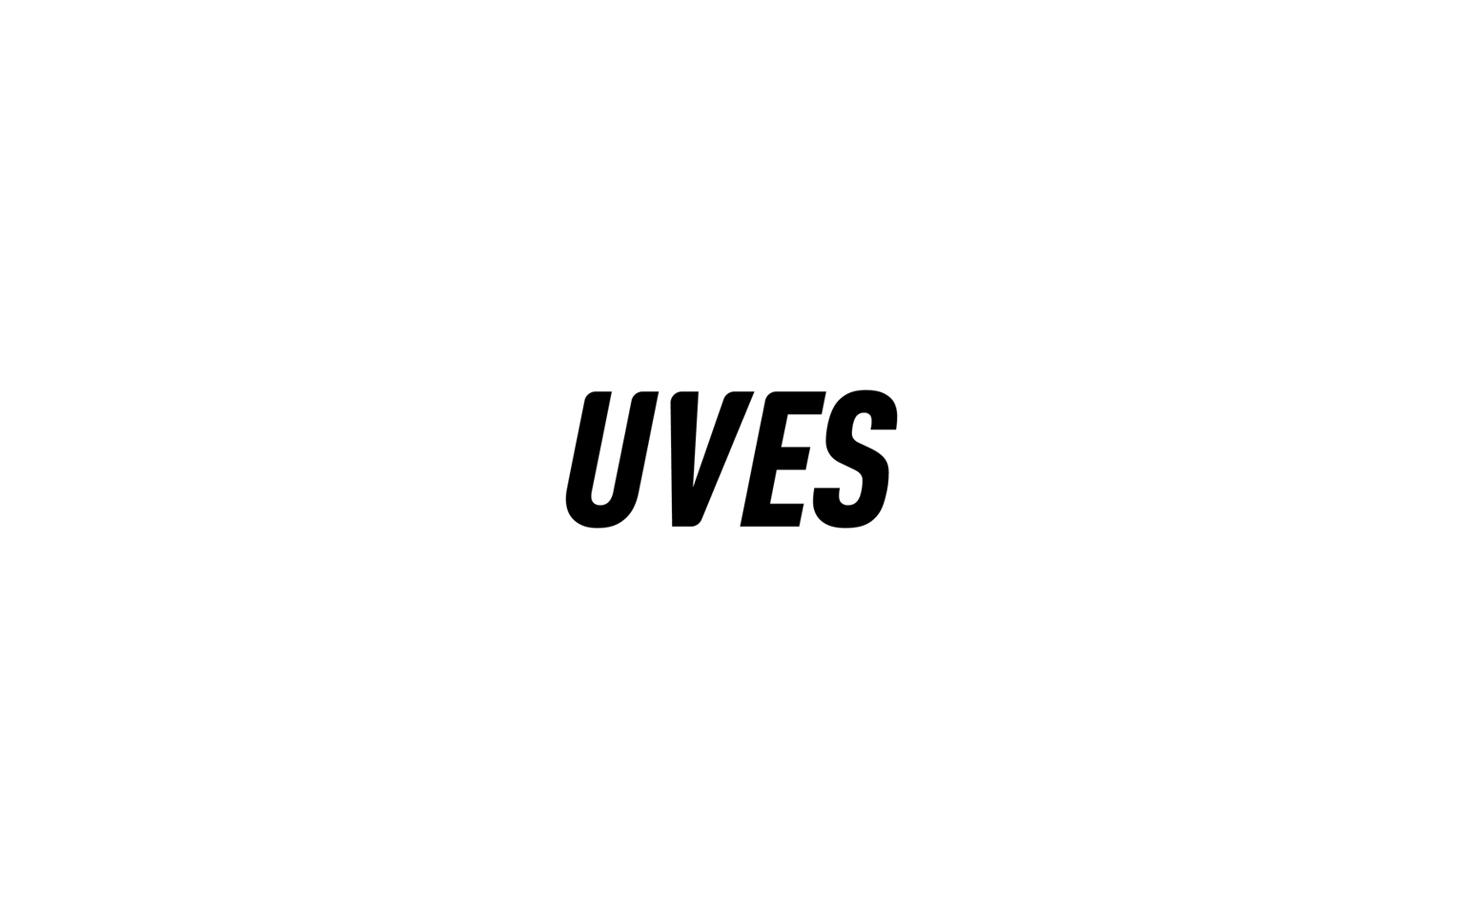 Imagenes_UVES_05